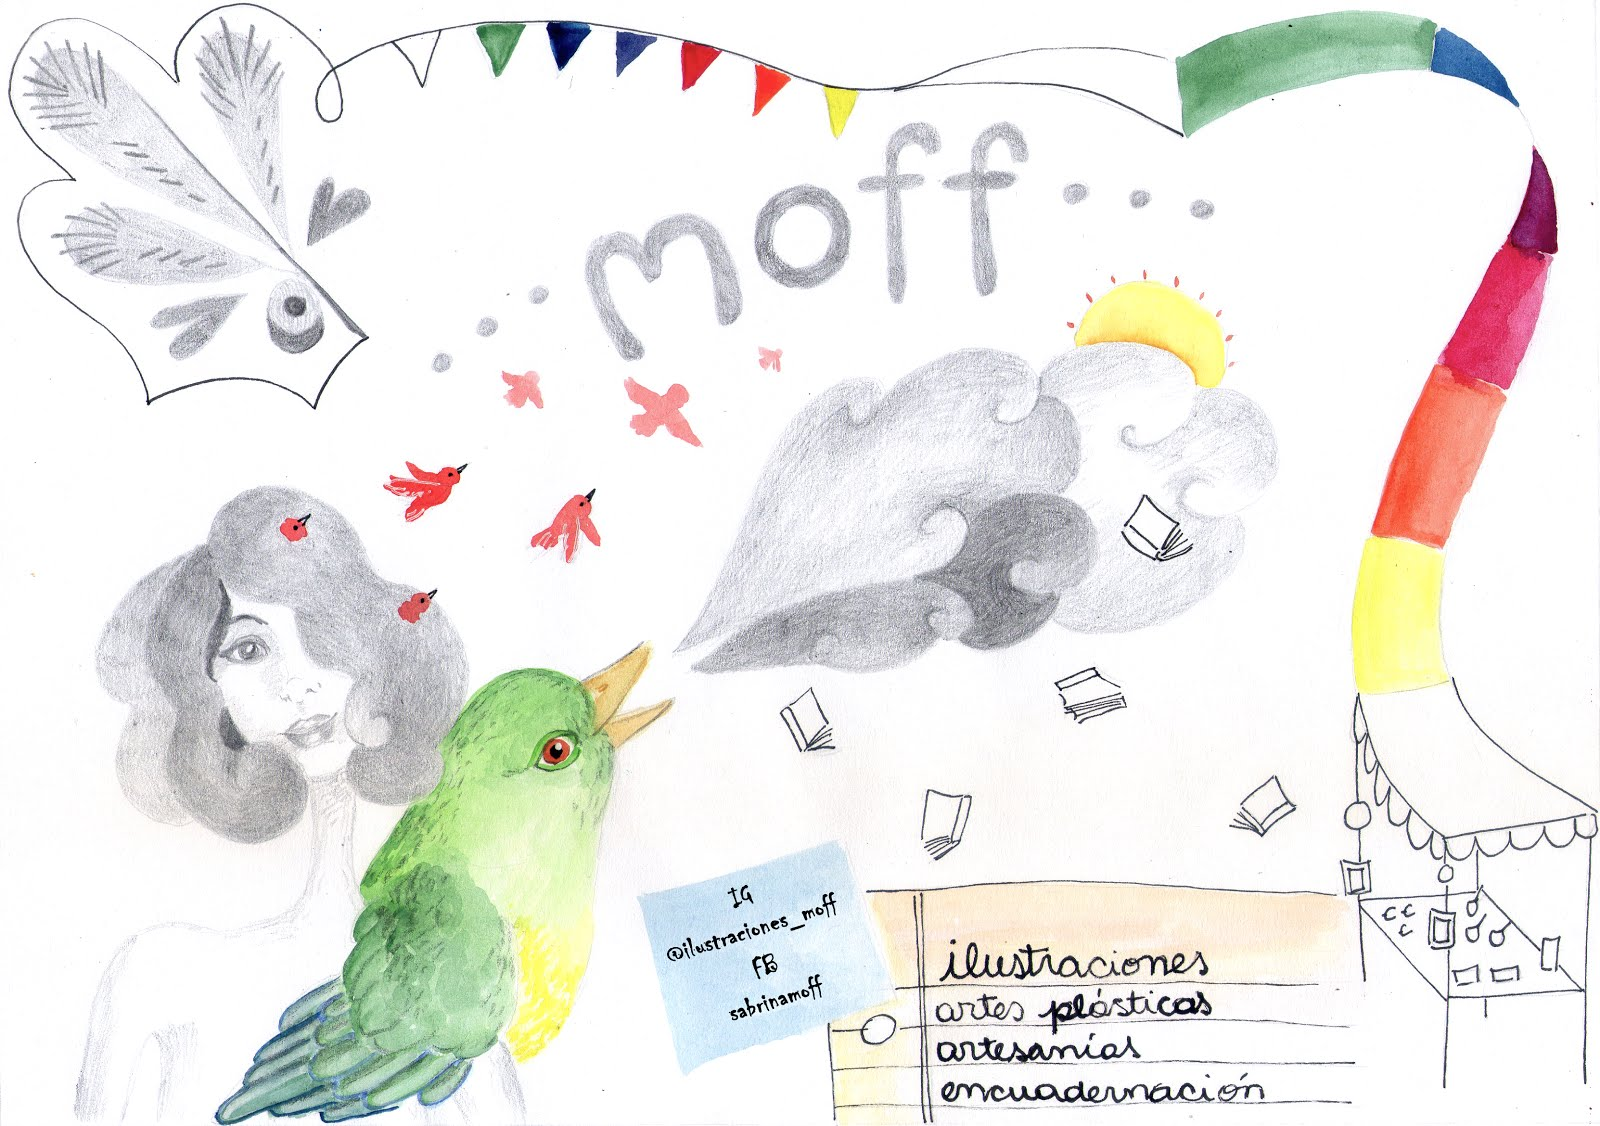 Sabrina Moff